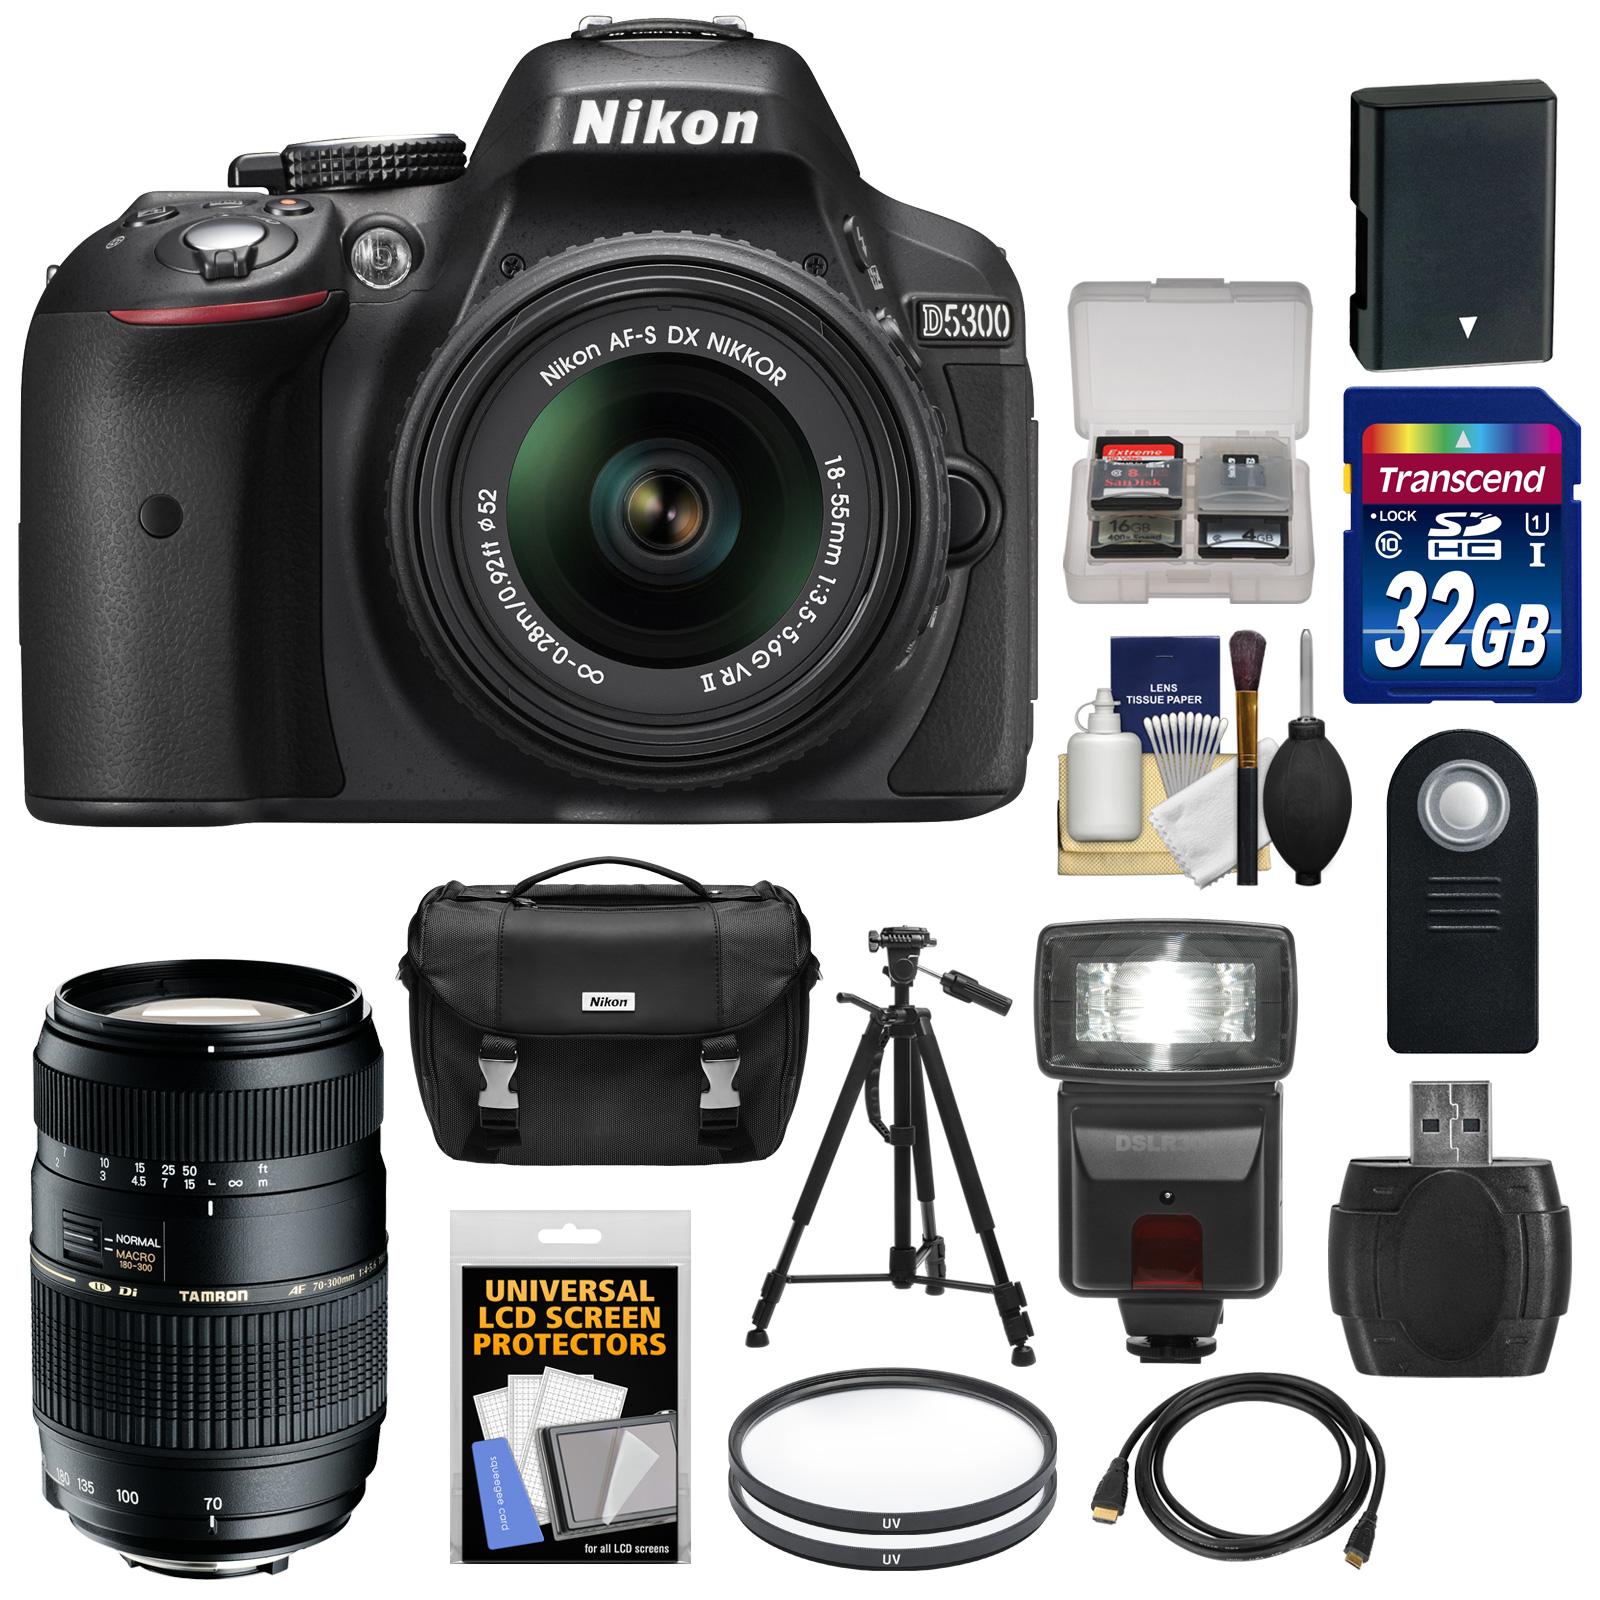 Nikon D5300 Digital SLR Camera & 18-55mm G VR Lens (Black) with 70-300mm Lens + 32GB Card + Battery + Case + Filters + Flash + Tripod + Accessory Kit